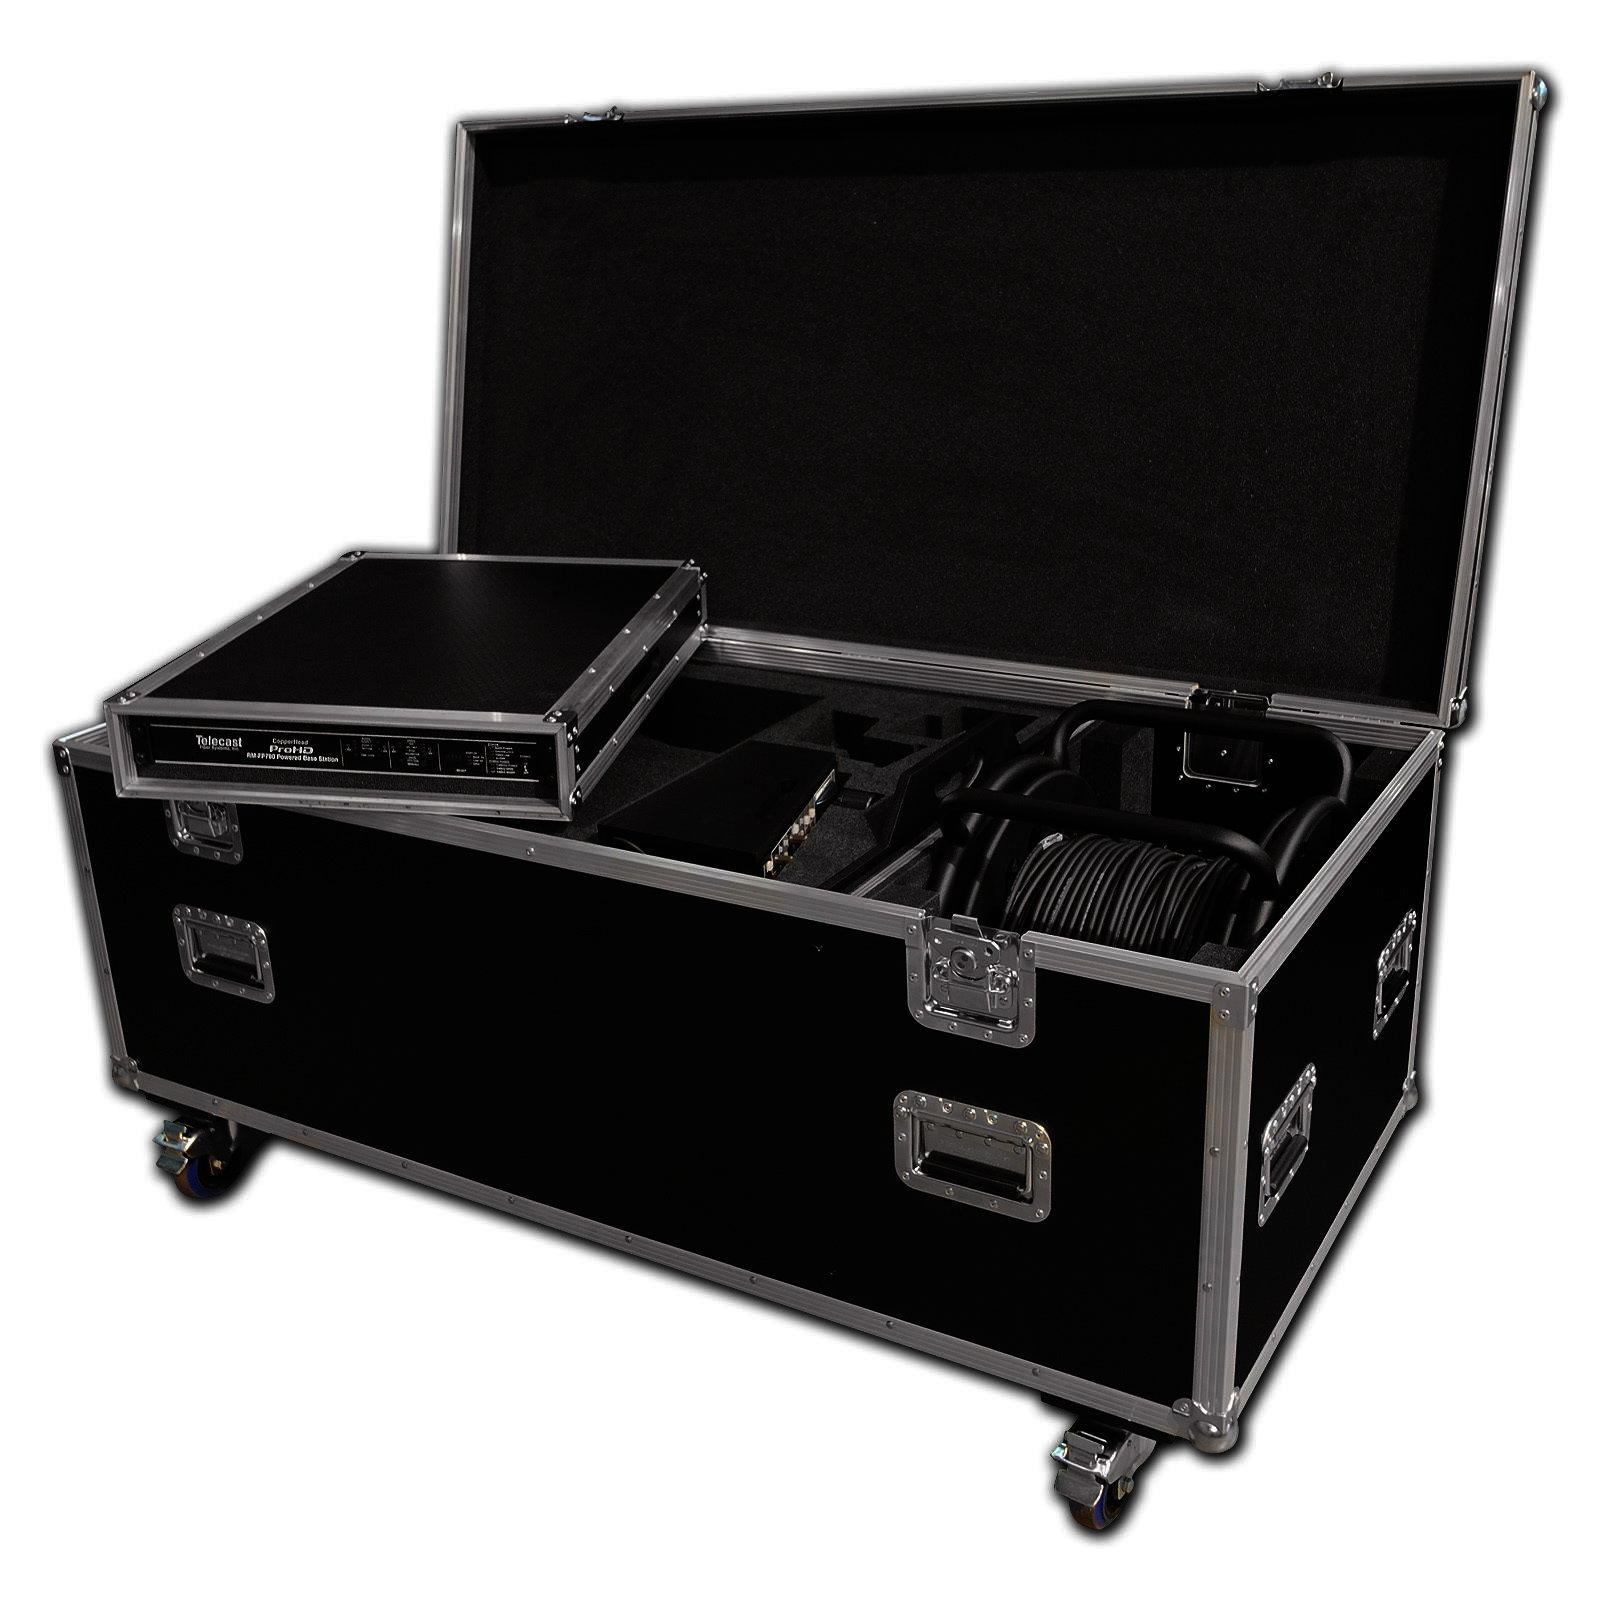 custom camcorder flight case with lens space cable drum. Black Bedroom Furniture Sets. Home Design Ideas